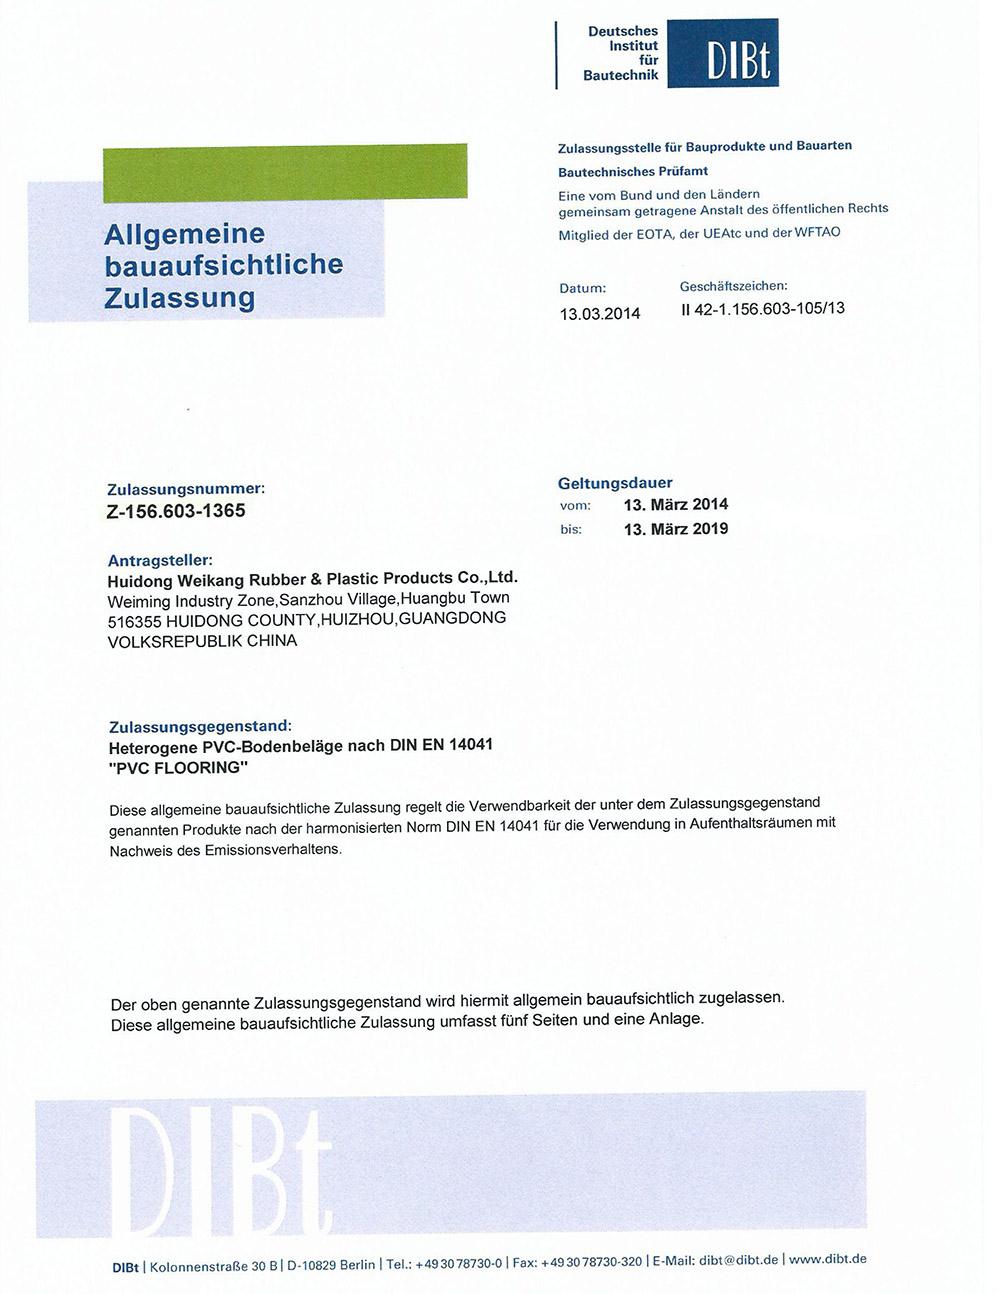 DIBT Certifications